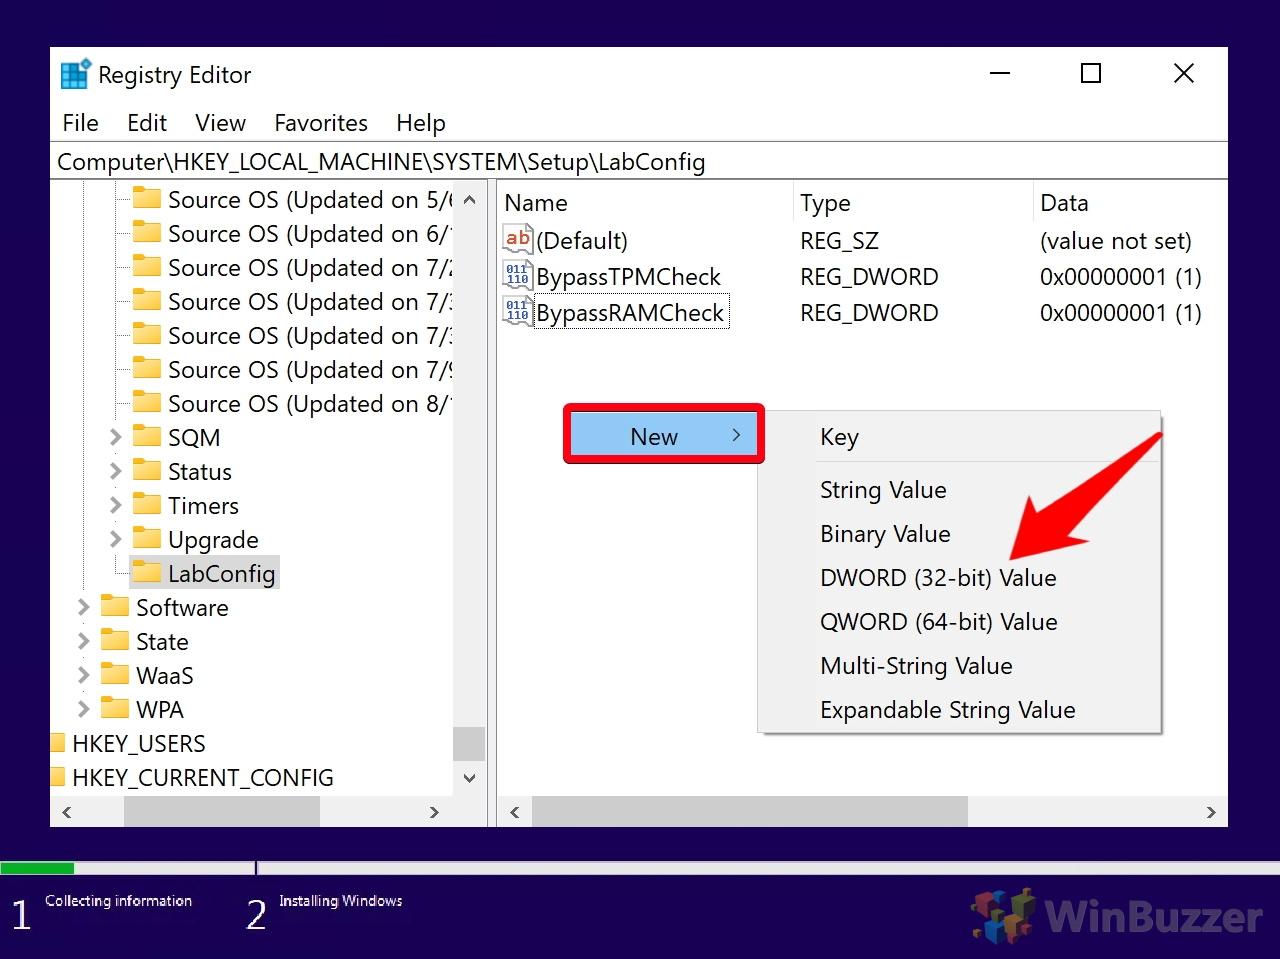 Windows 10 - Windows Setup - Can´t run Windows 10 - Command Prompt - Registry Editor - Navigate to - Setup - LabConfig - New DWORD